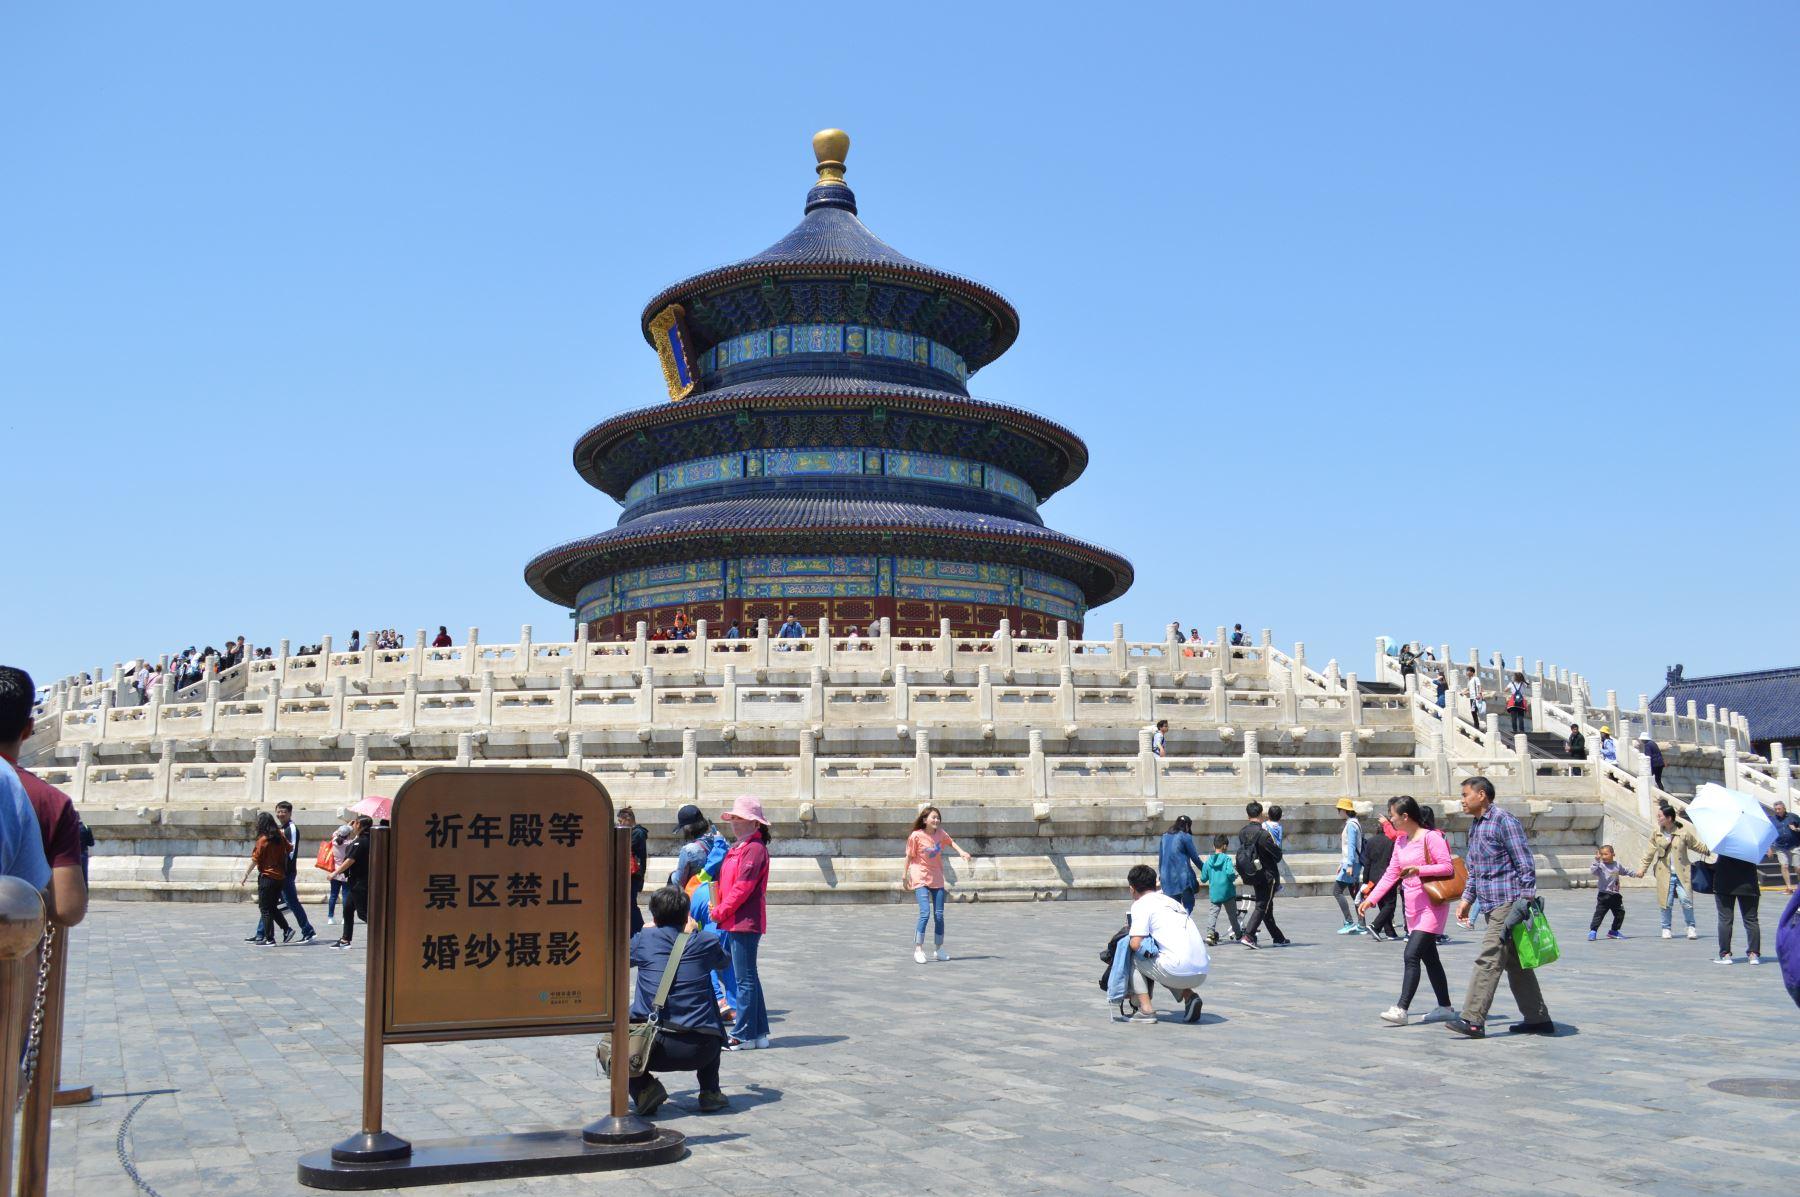 Templo del Cielo, en Beijing, China. Foto: ANDINA/Víctor Véliz.